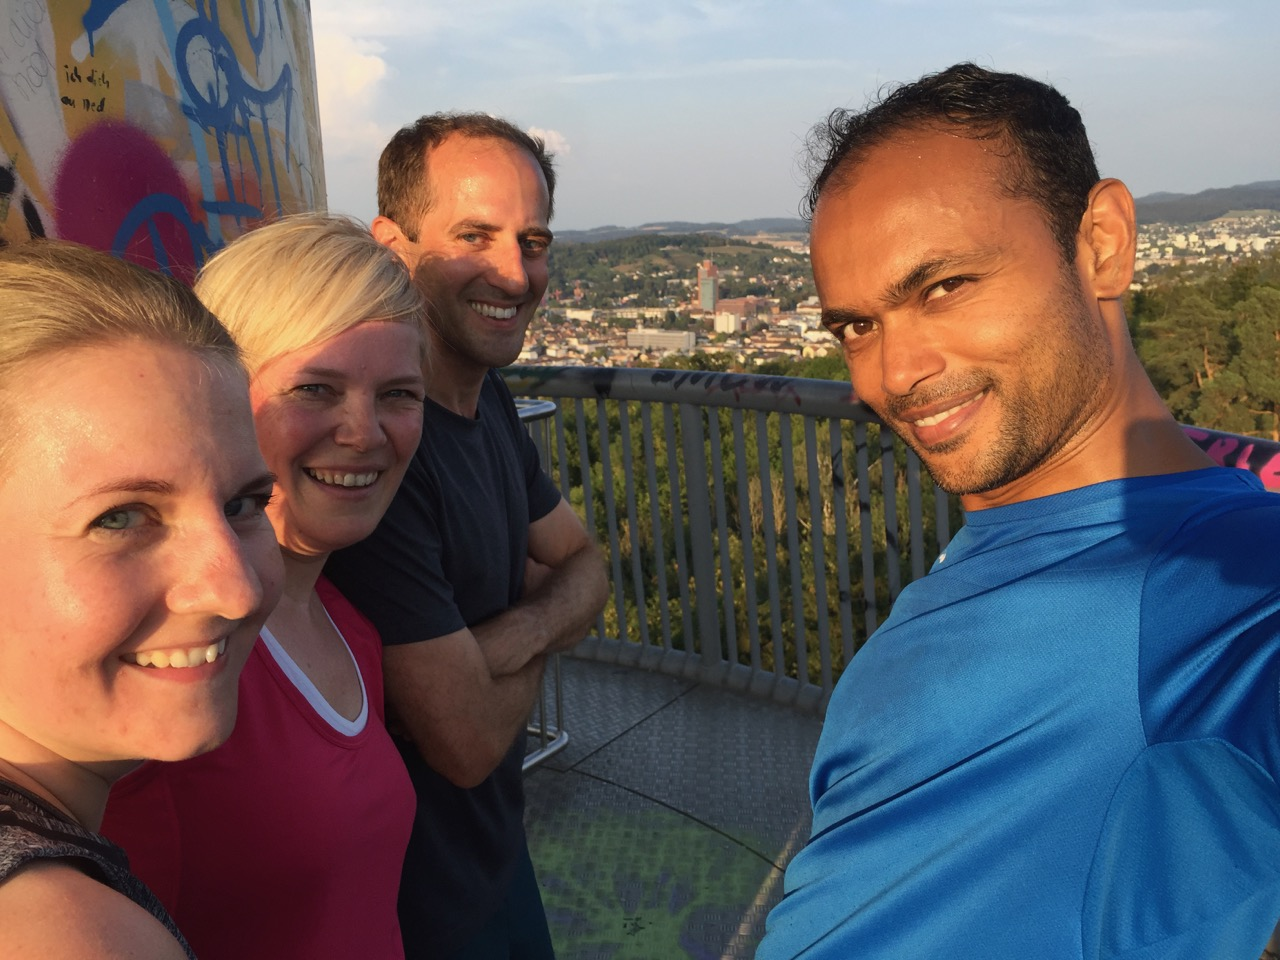 jerry kadavil Personal Trainer Training Winterthur Zürich Golf Pilates Yoga Crossfit Massage boot camp tantra hiit abnehmen trx